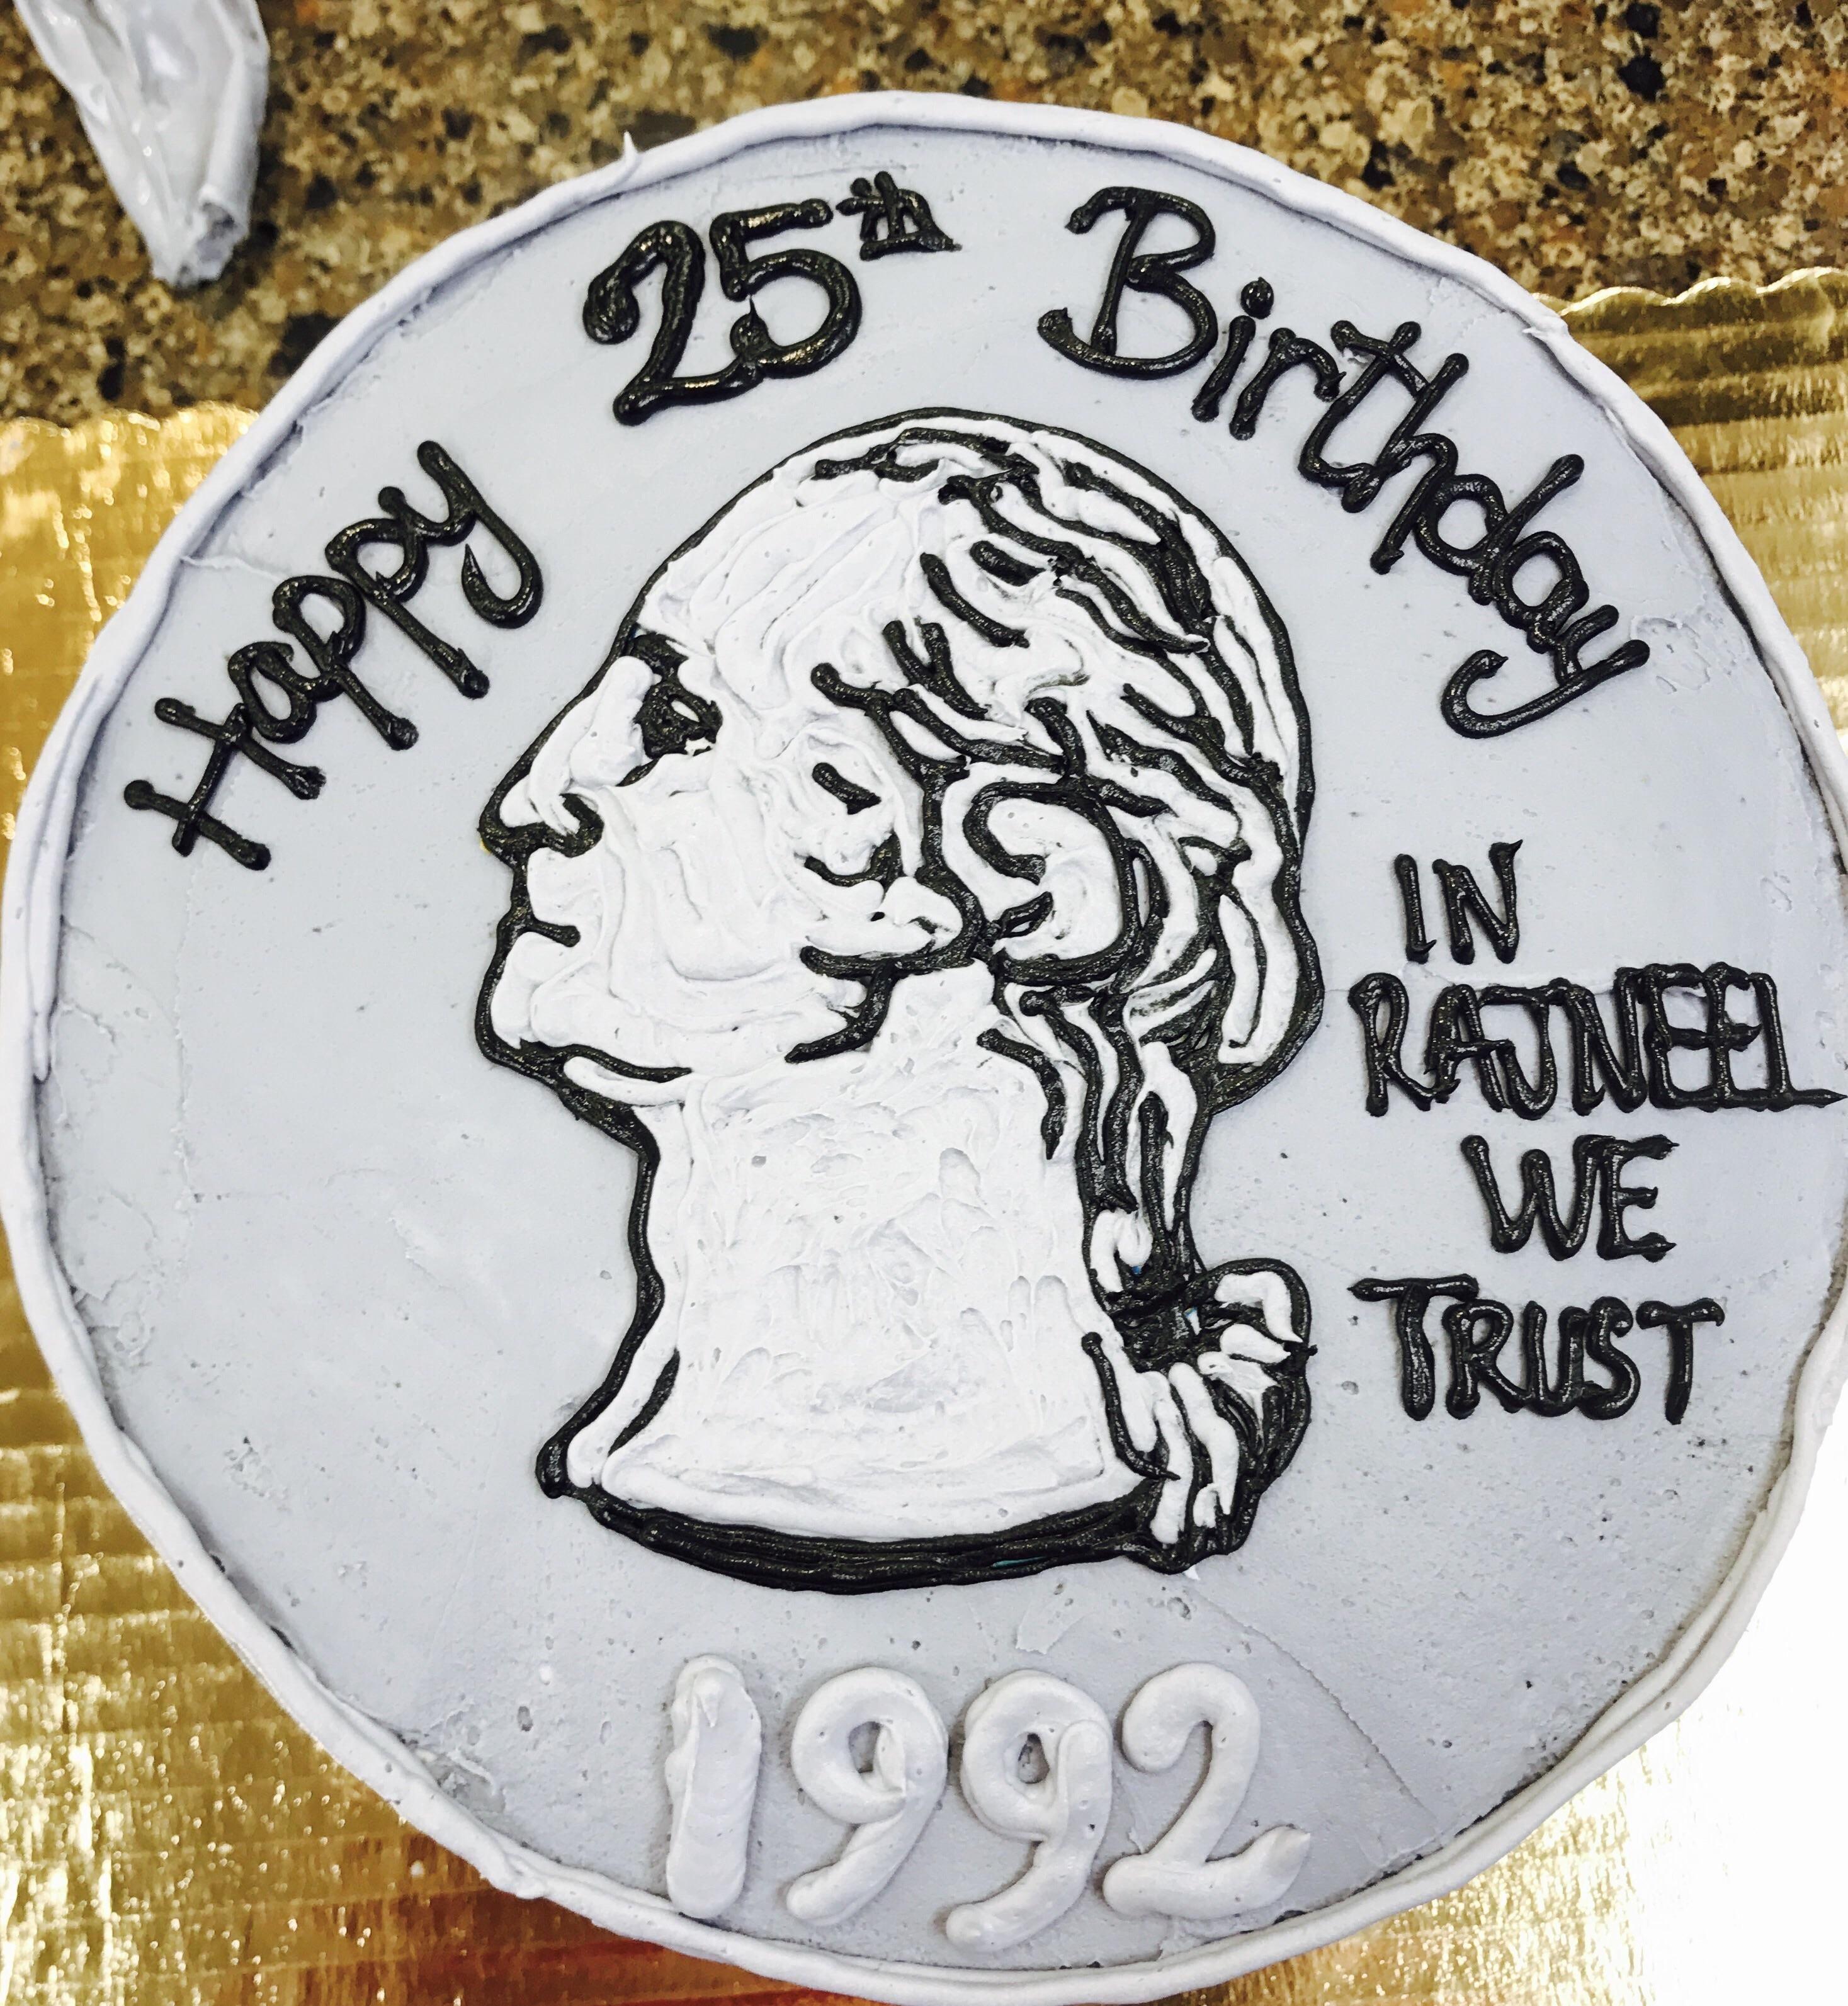 38++ 25th birthday cake ideas for him ideas